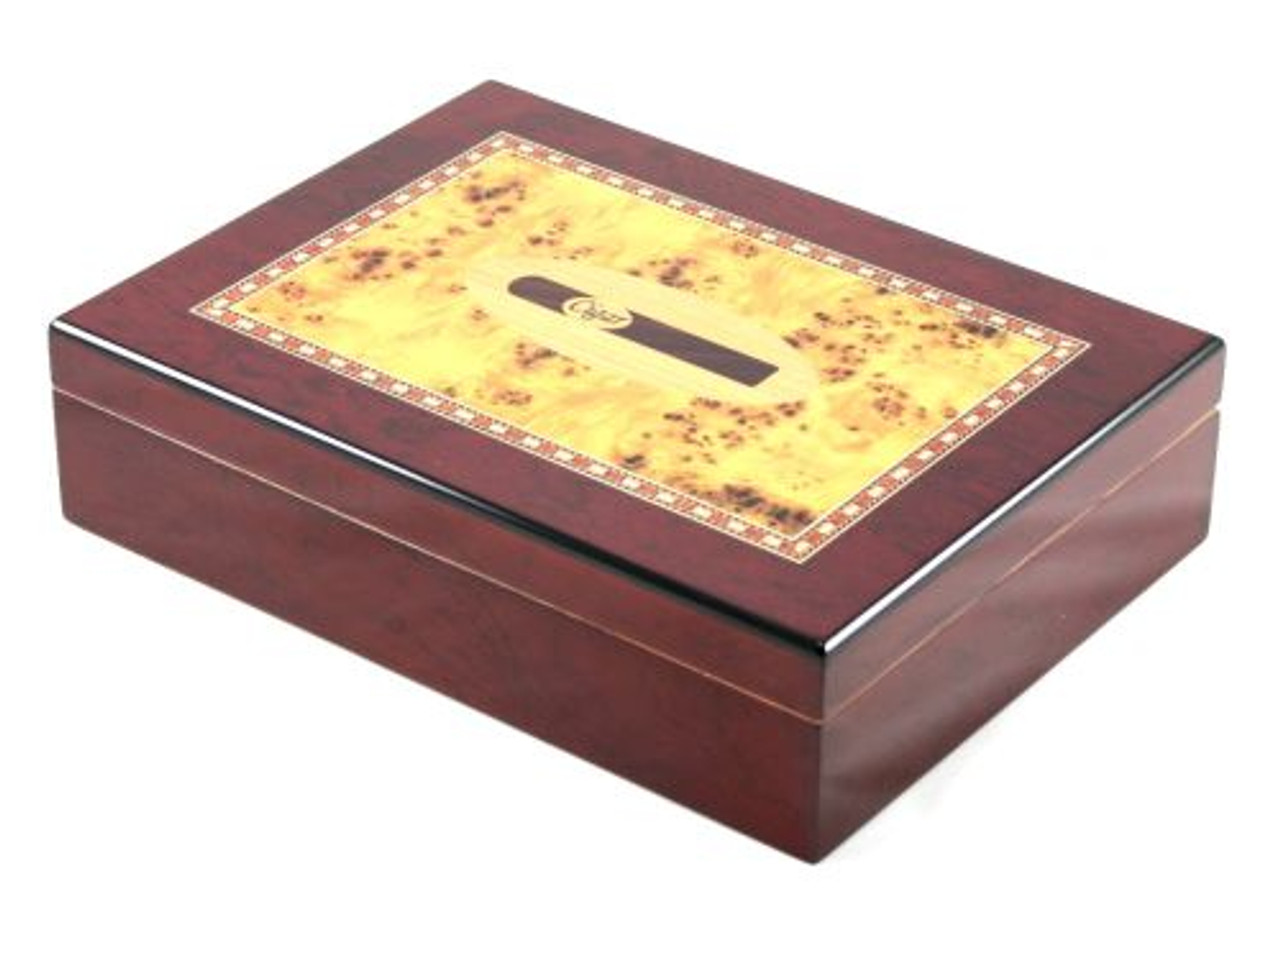 Carlitos Cigar Humidor